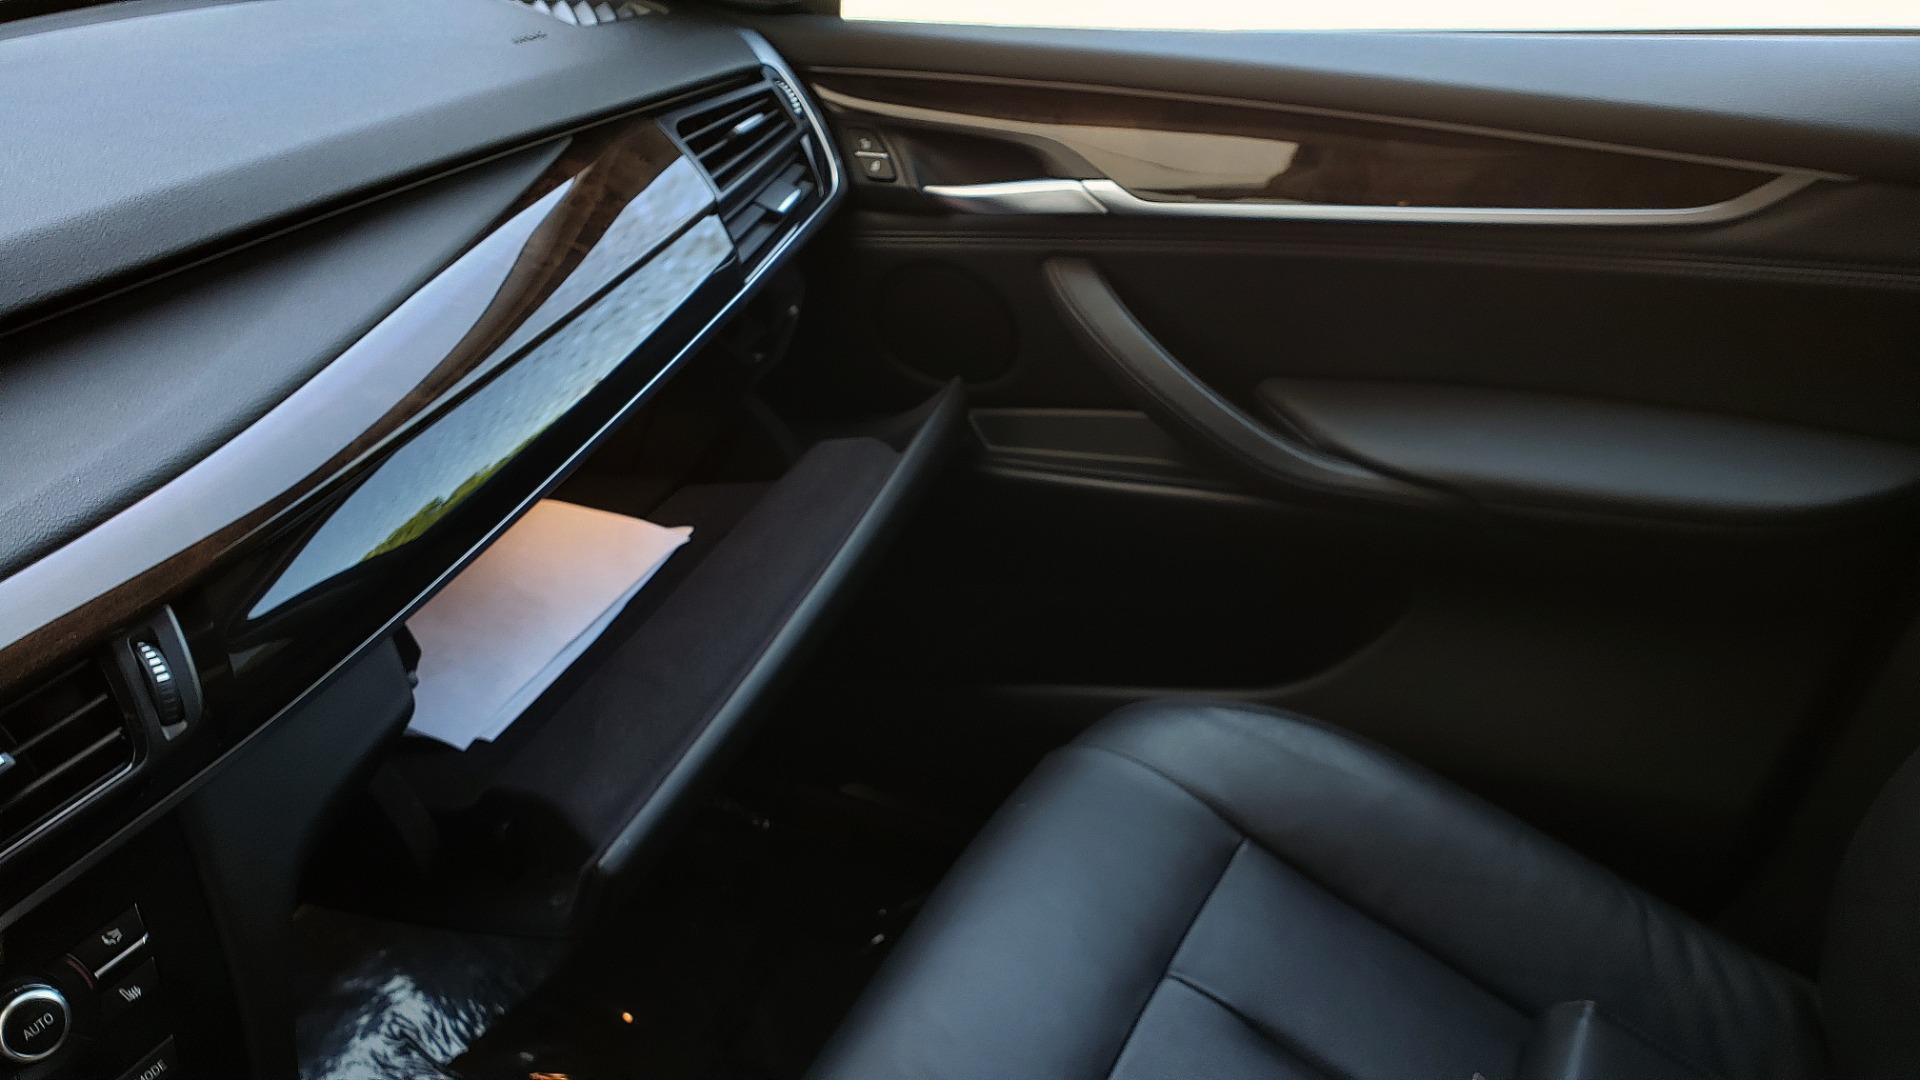 Used 2016 BMW X5 XDRIVE35I / PREM PKG / NAV / DRVR ASST PLUS / REARVIEW for sale $25,765 at Formula Imports in Charlotte NC 28227 39